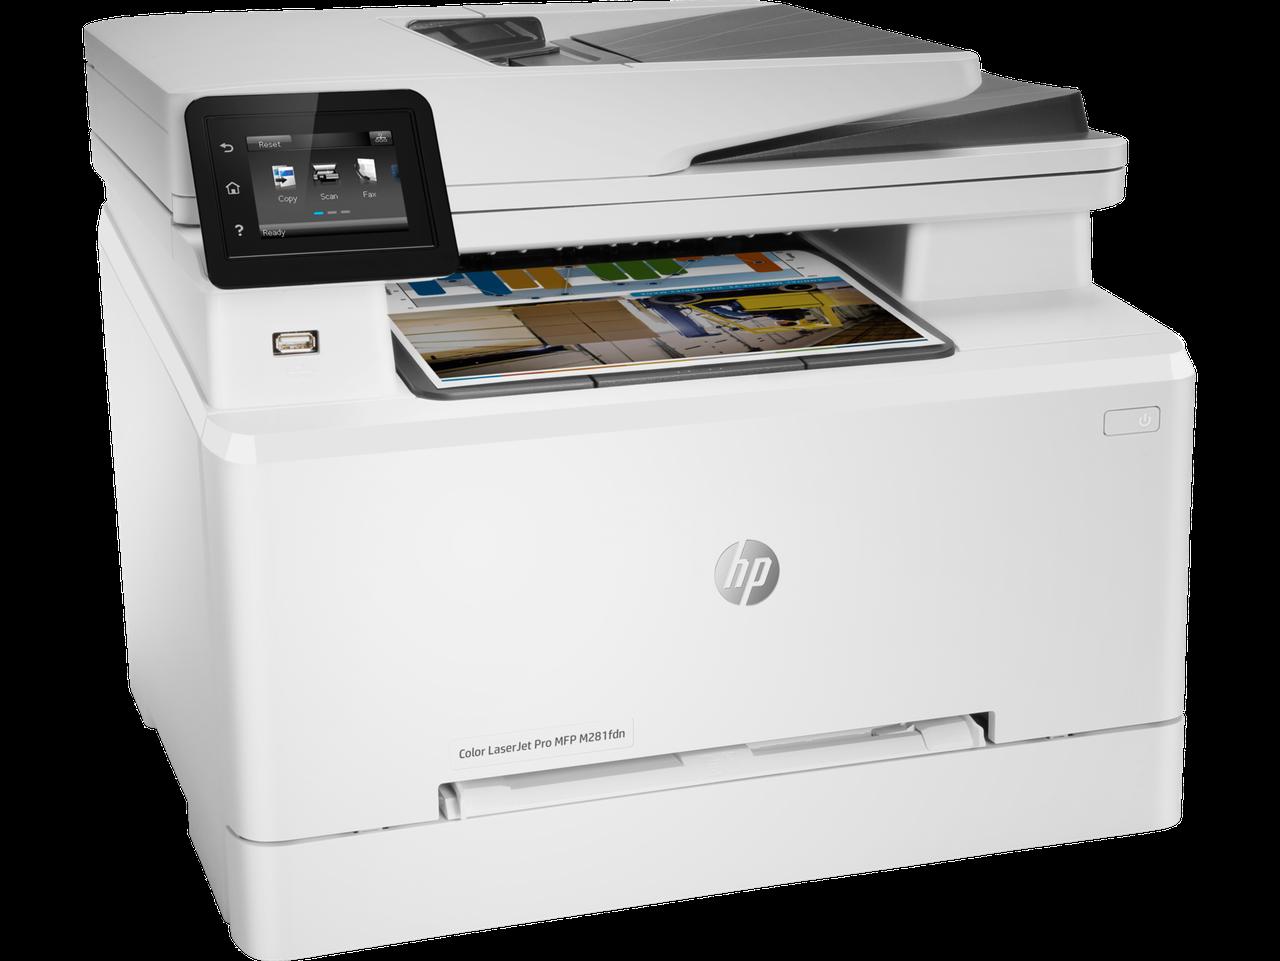 МФУHP T6B81A HP Color LaserJet Pro MFP M281fdn Prntr (A4) Printer/Scanner/Copier/Fax/ADF, 600 dpi, 21 ppm, 80